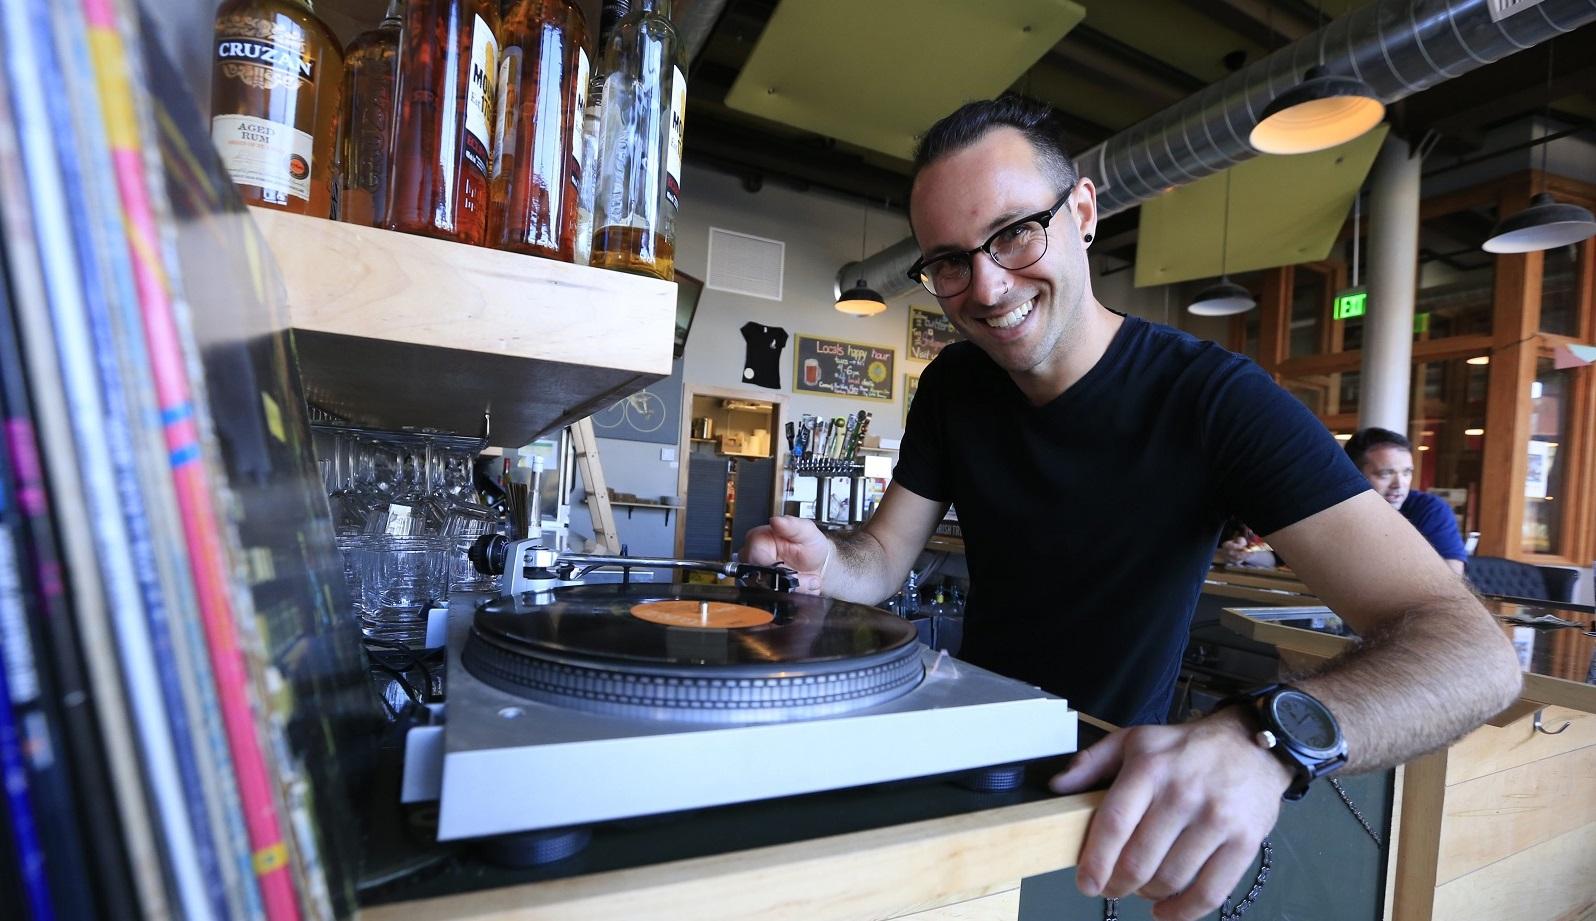 Handlebar Pub bartender Adam Rath plays vinyl records on Swan Street in downtown Buffalo. (Harry Scull Jr./Buffalo News)